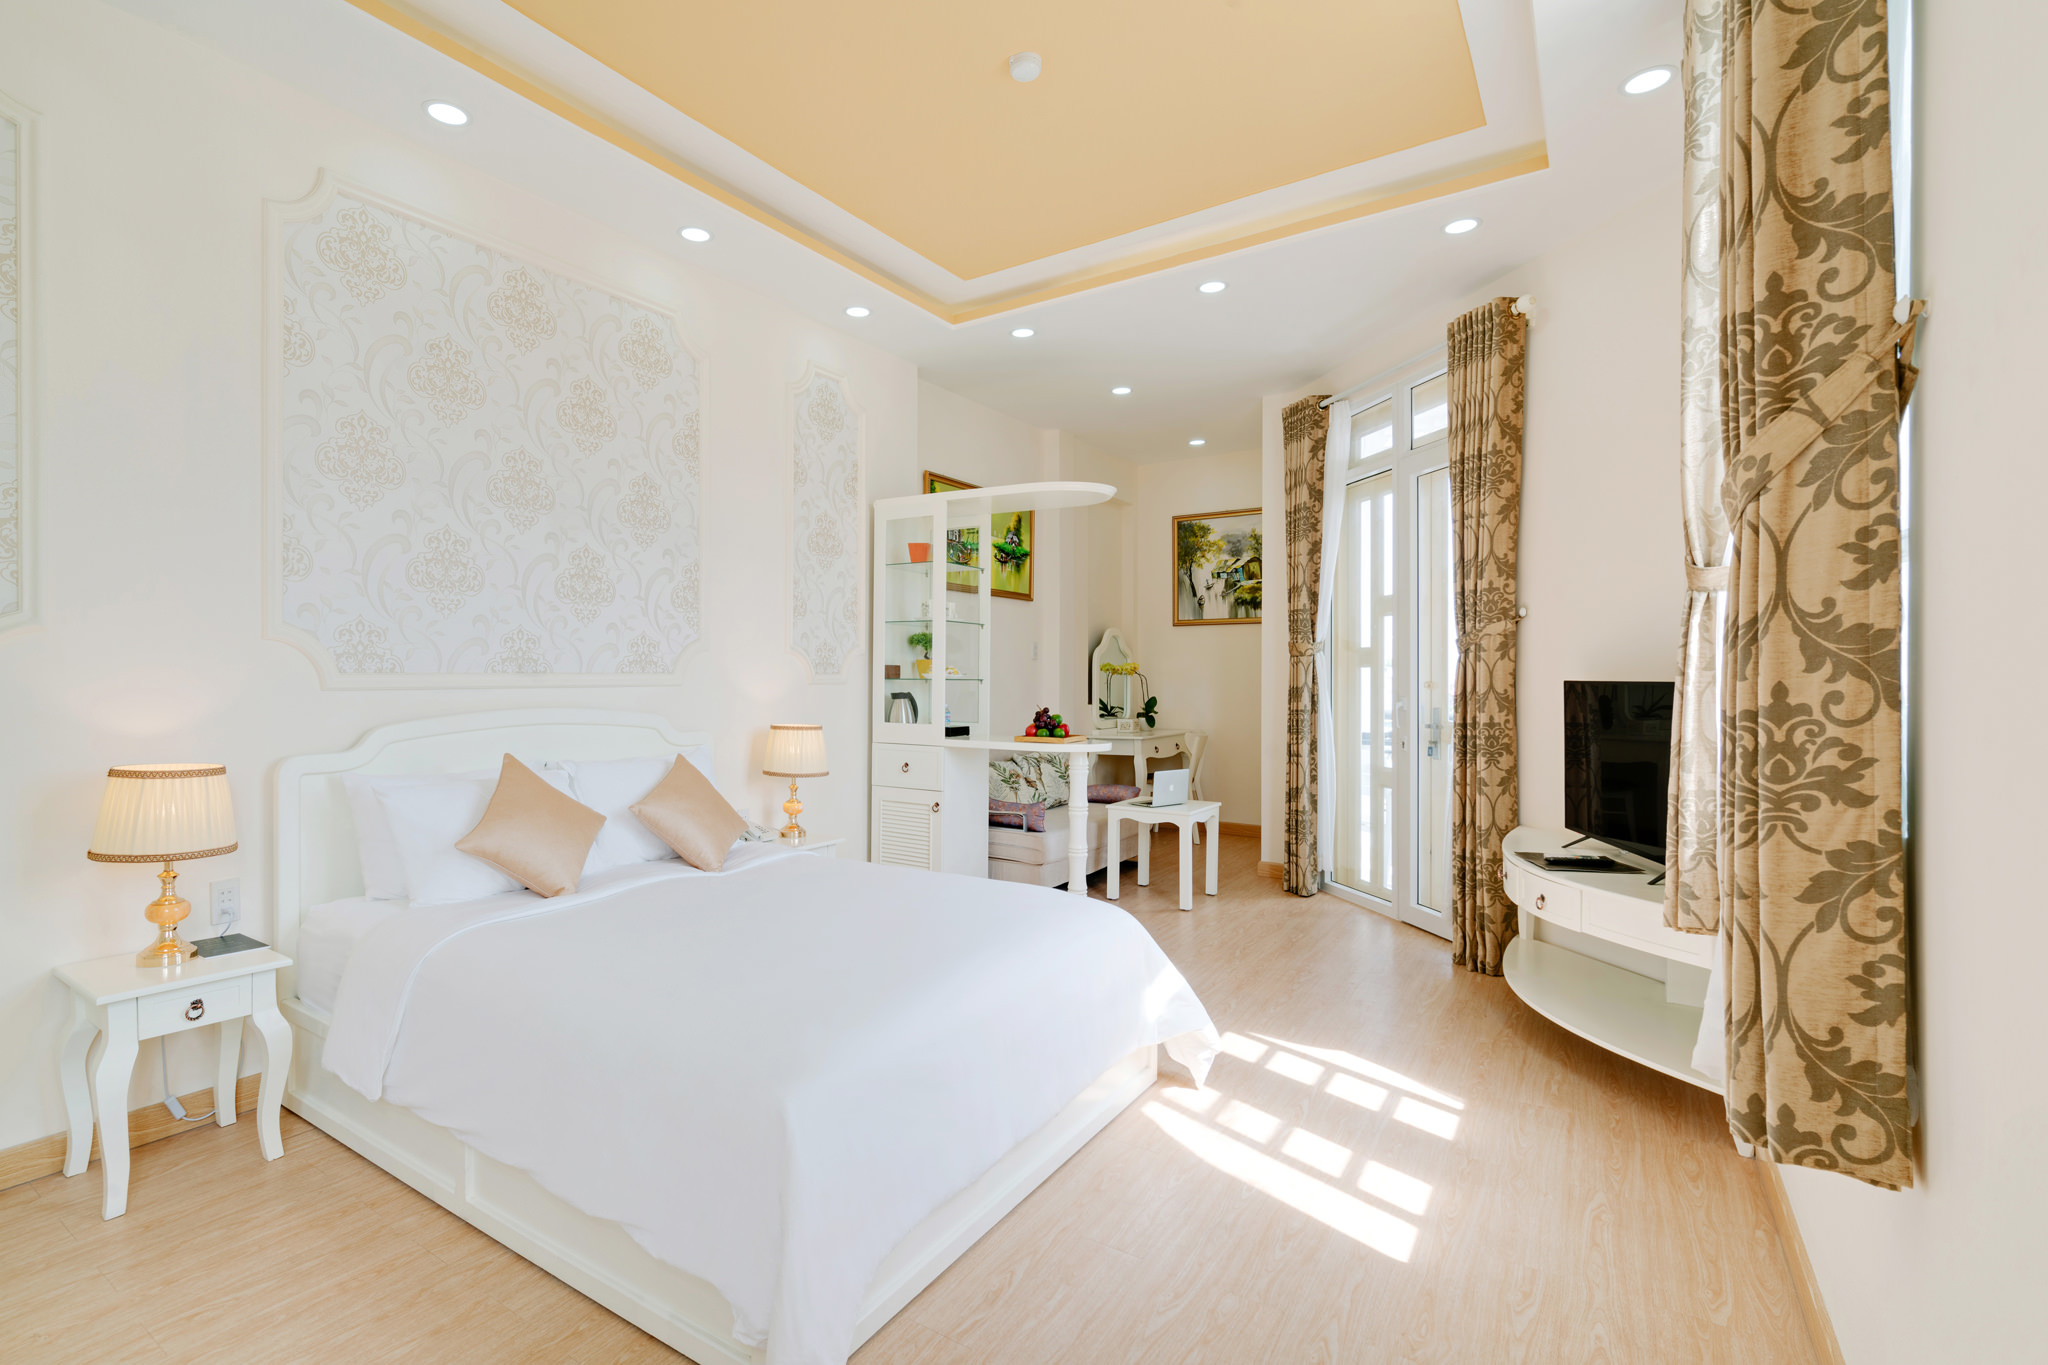 20180529 - Chez Mimosa - Interior - Hotel - 011.jpg